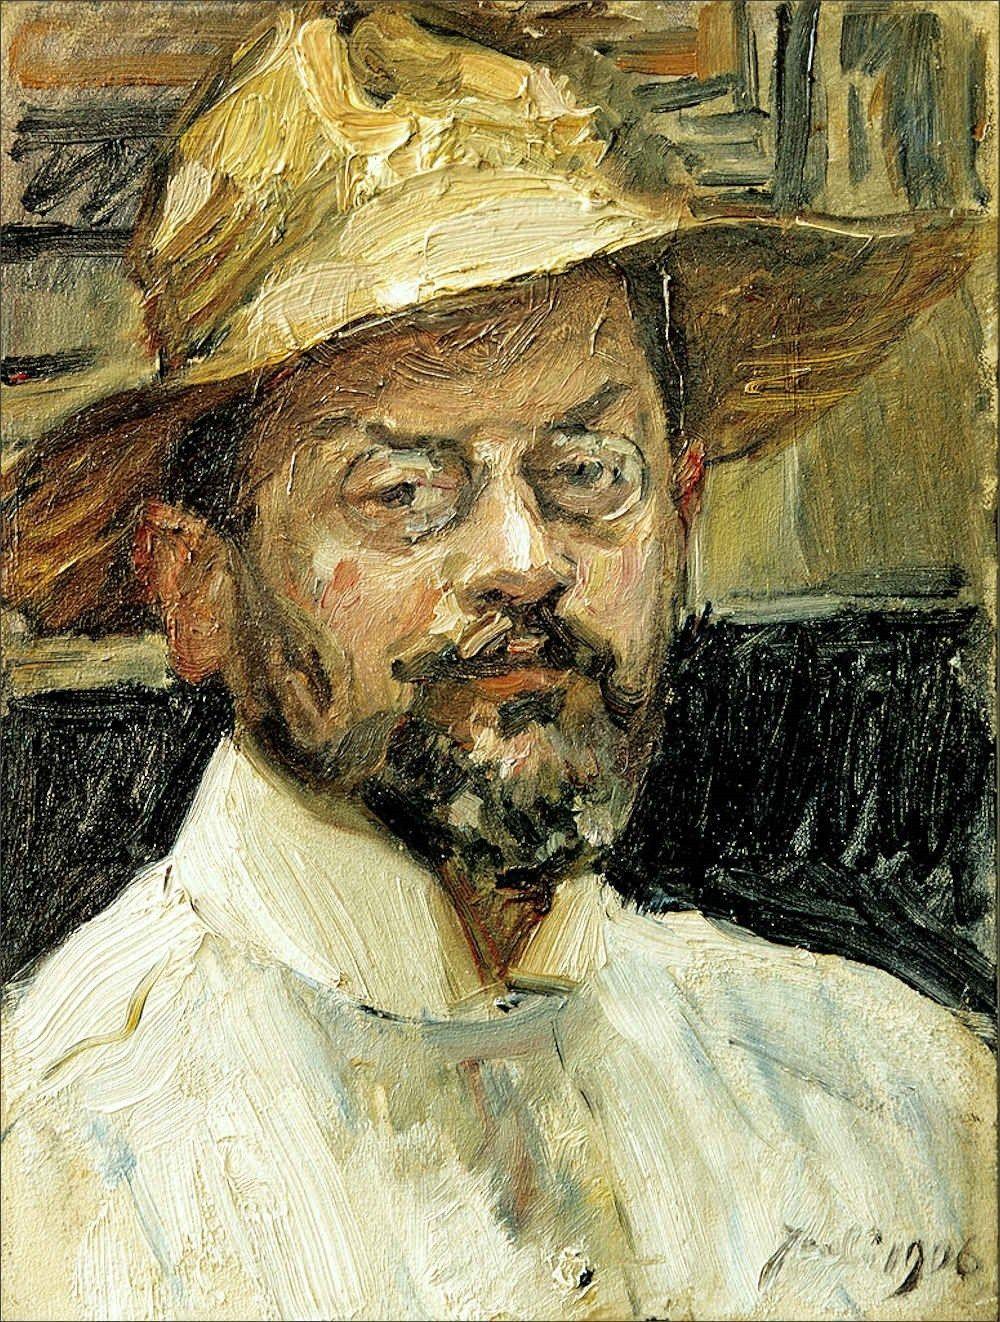 Max Slevogt · Autoritratto · 1906 · Ubicazione ignota